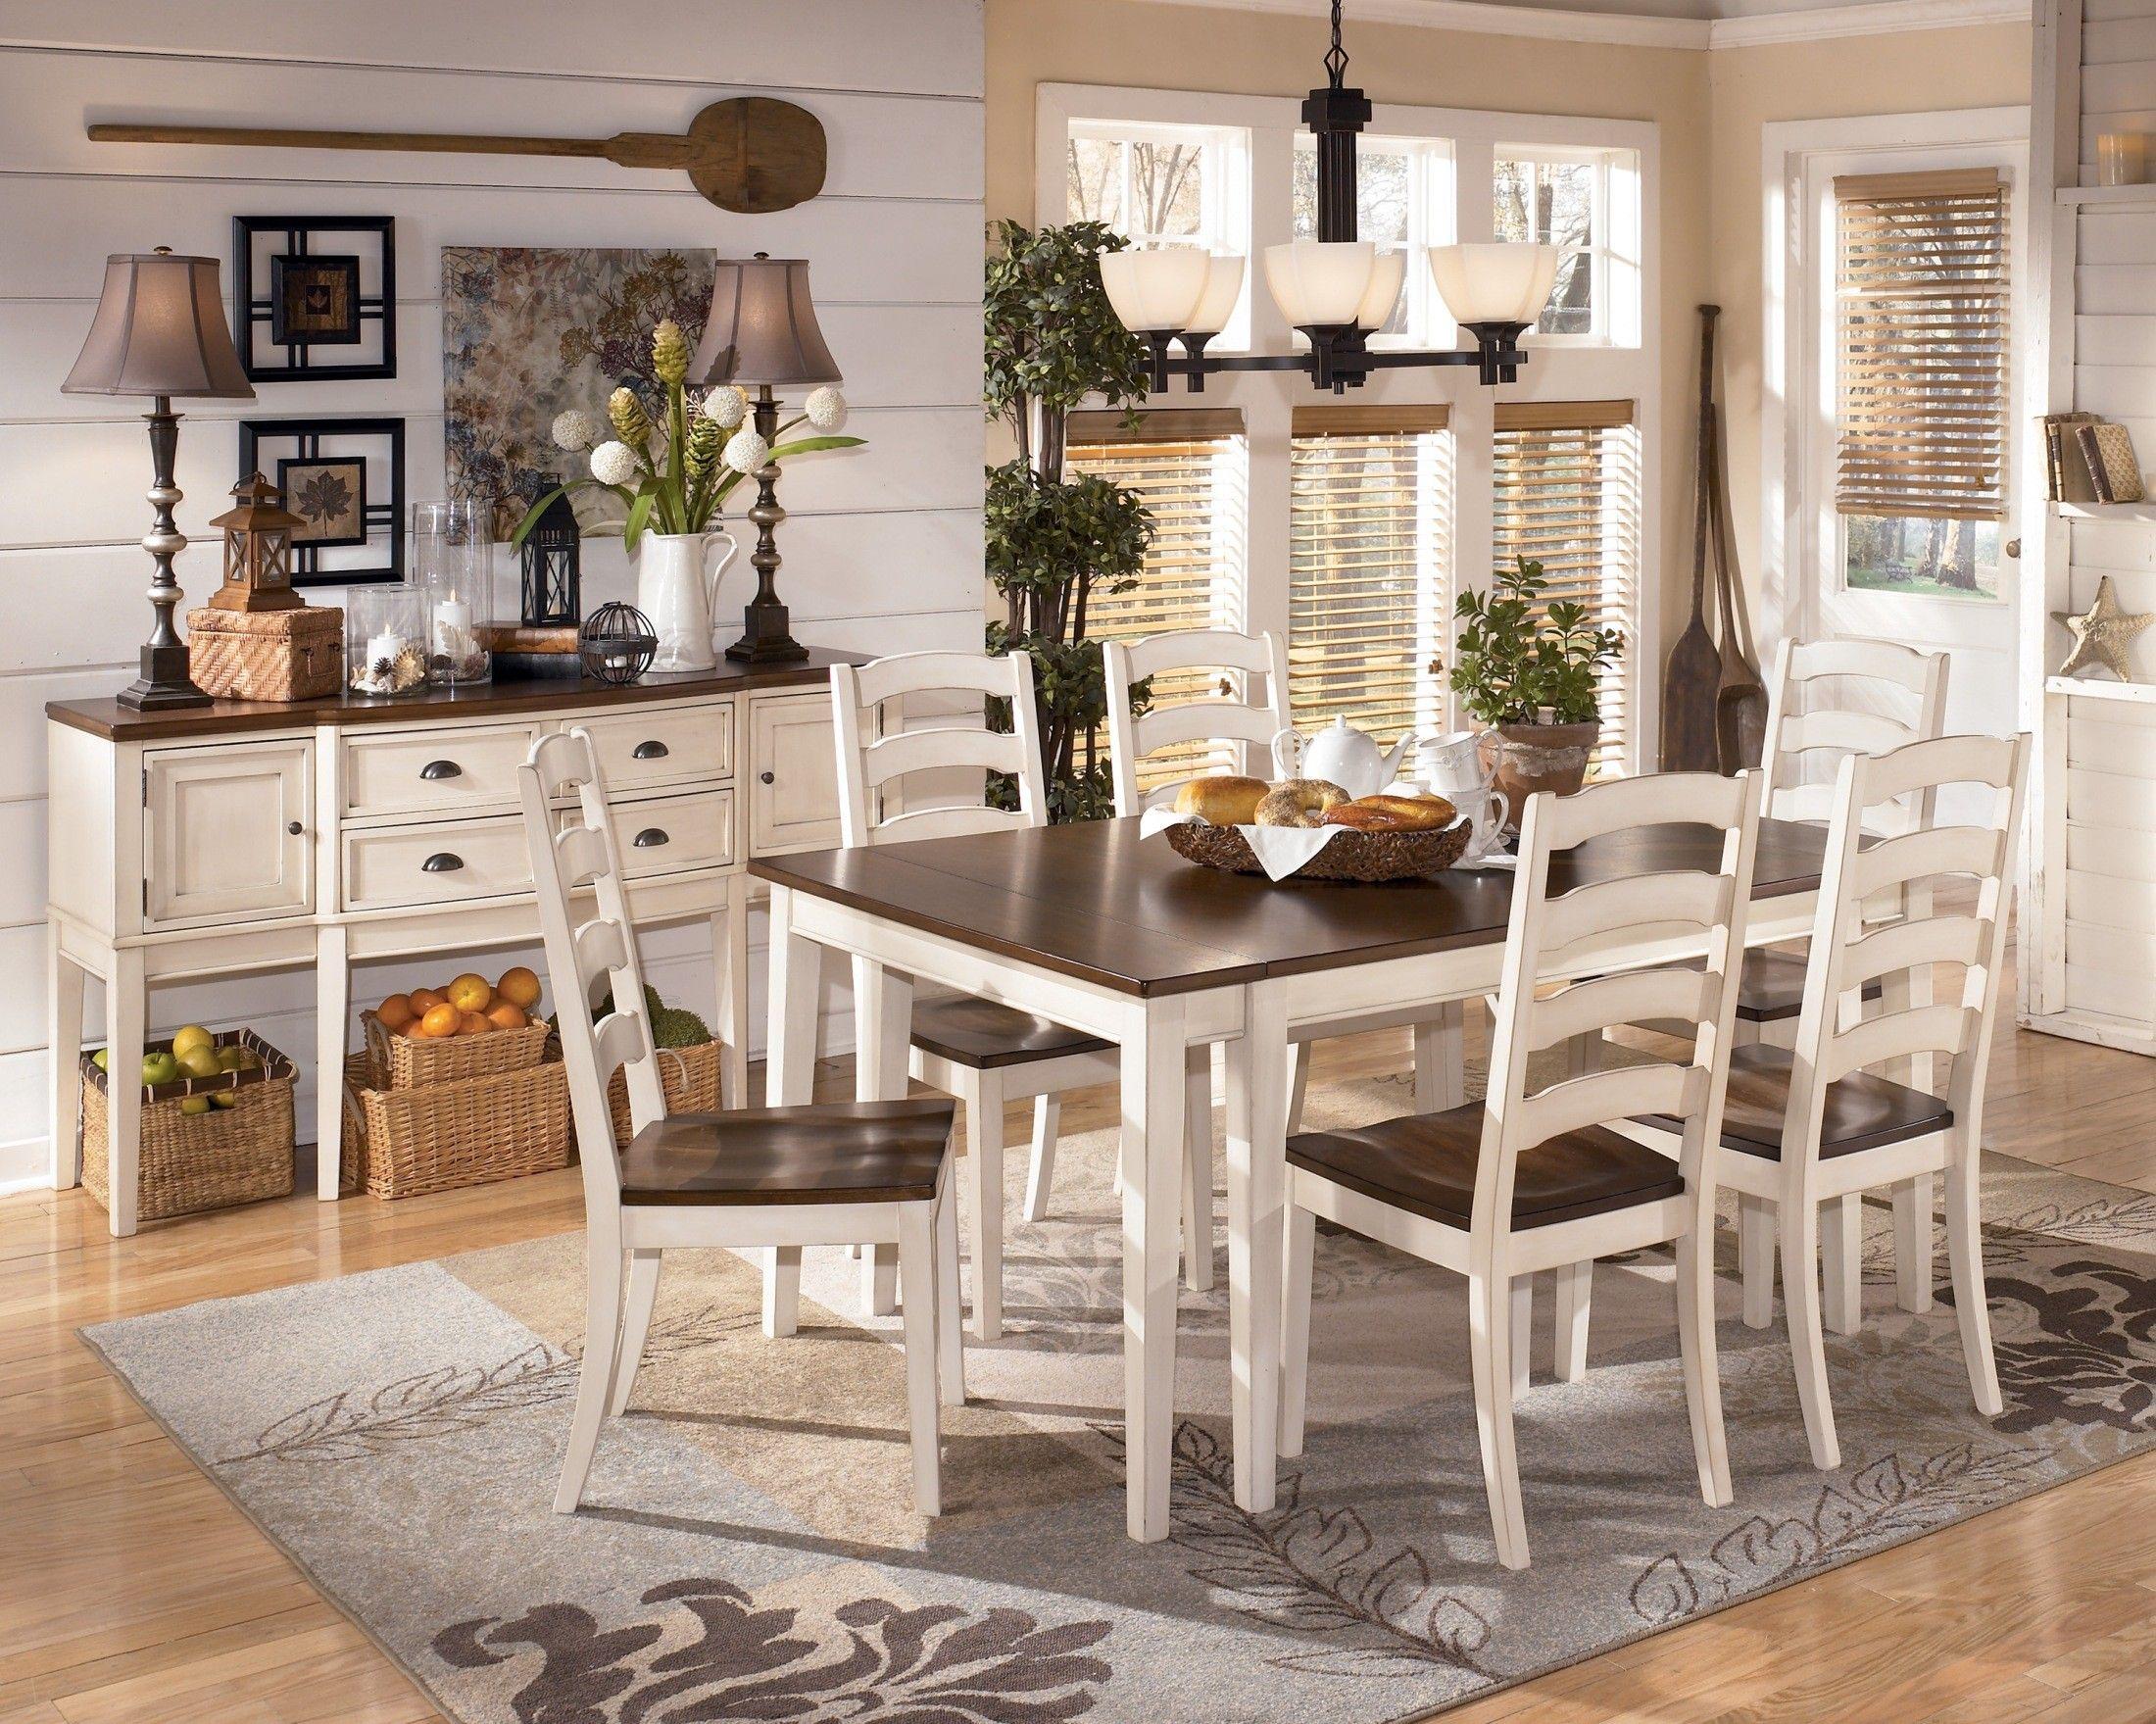 Whitesburg Dining Room Set My New Furniture